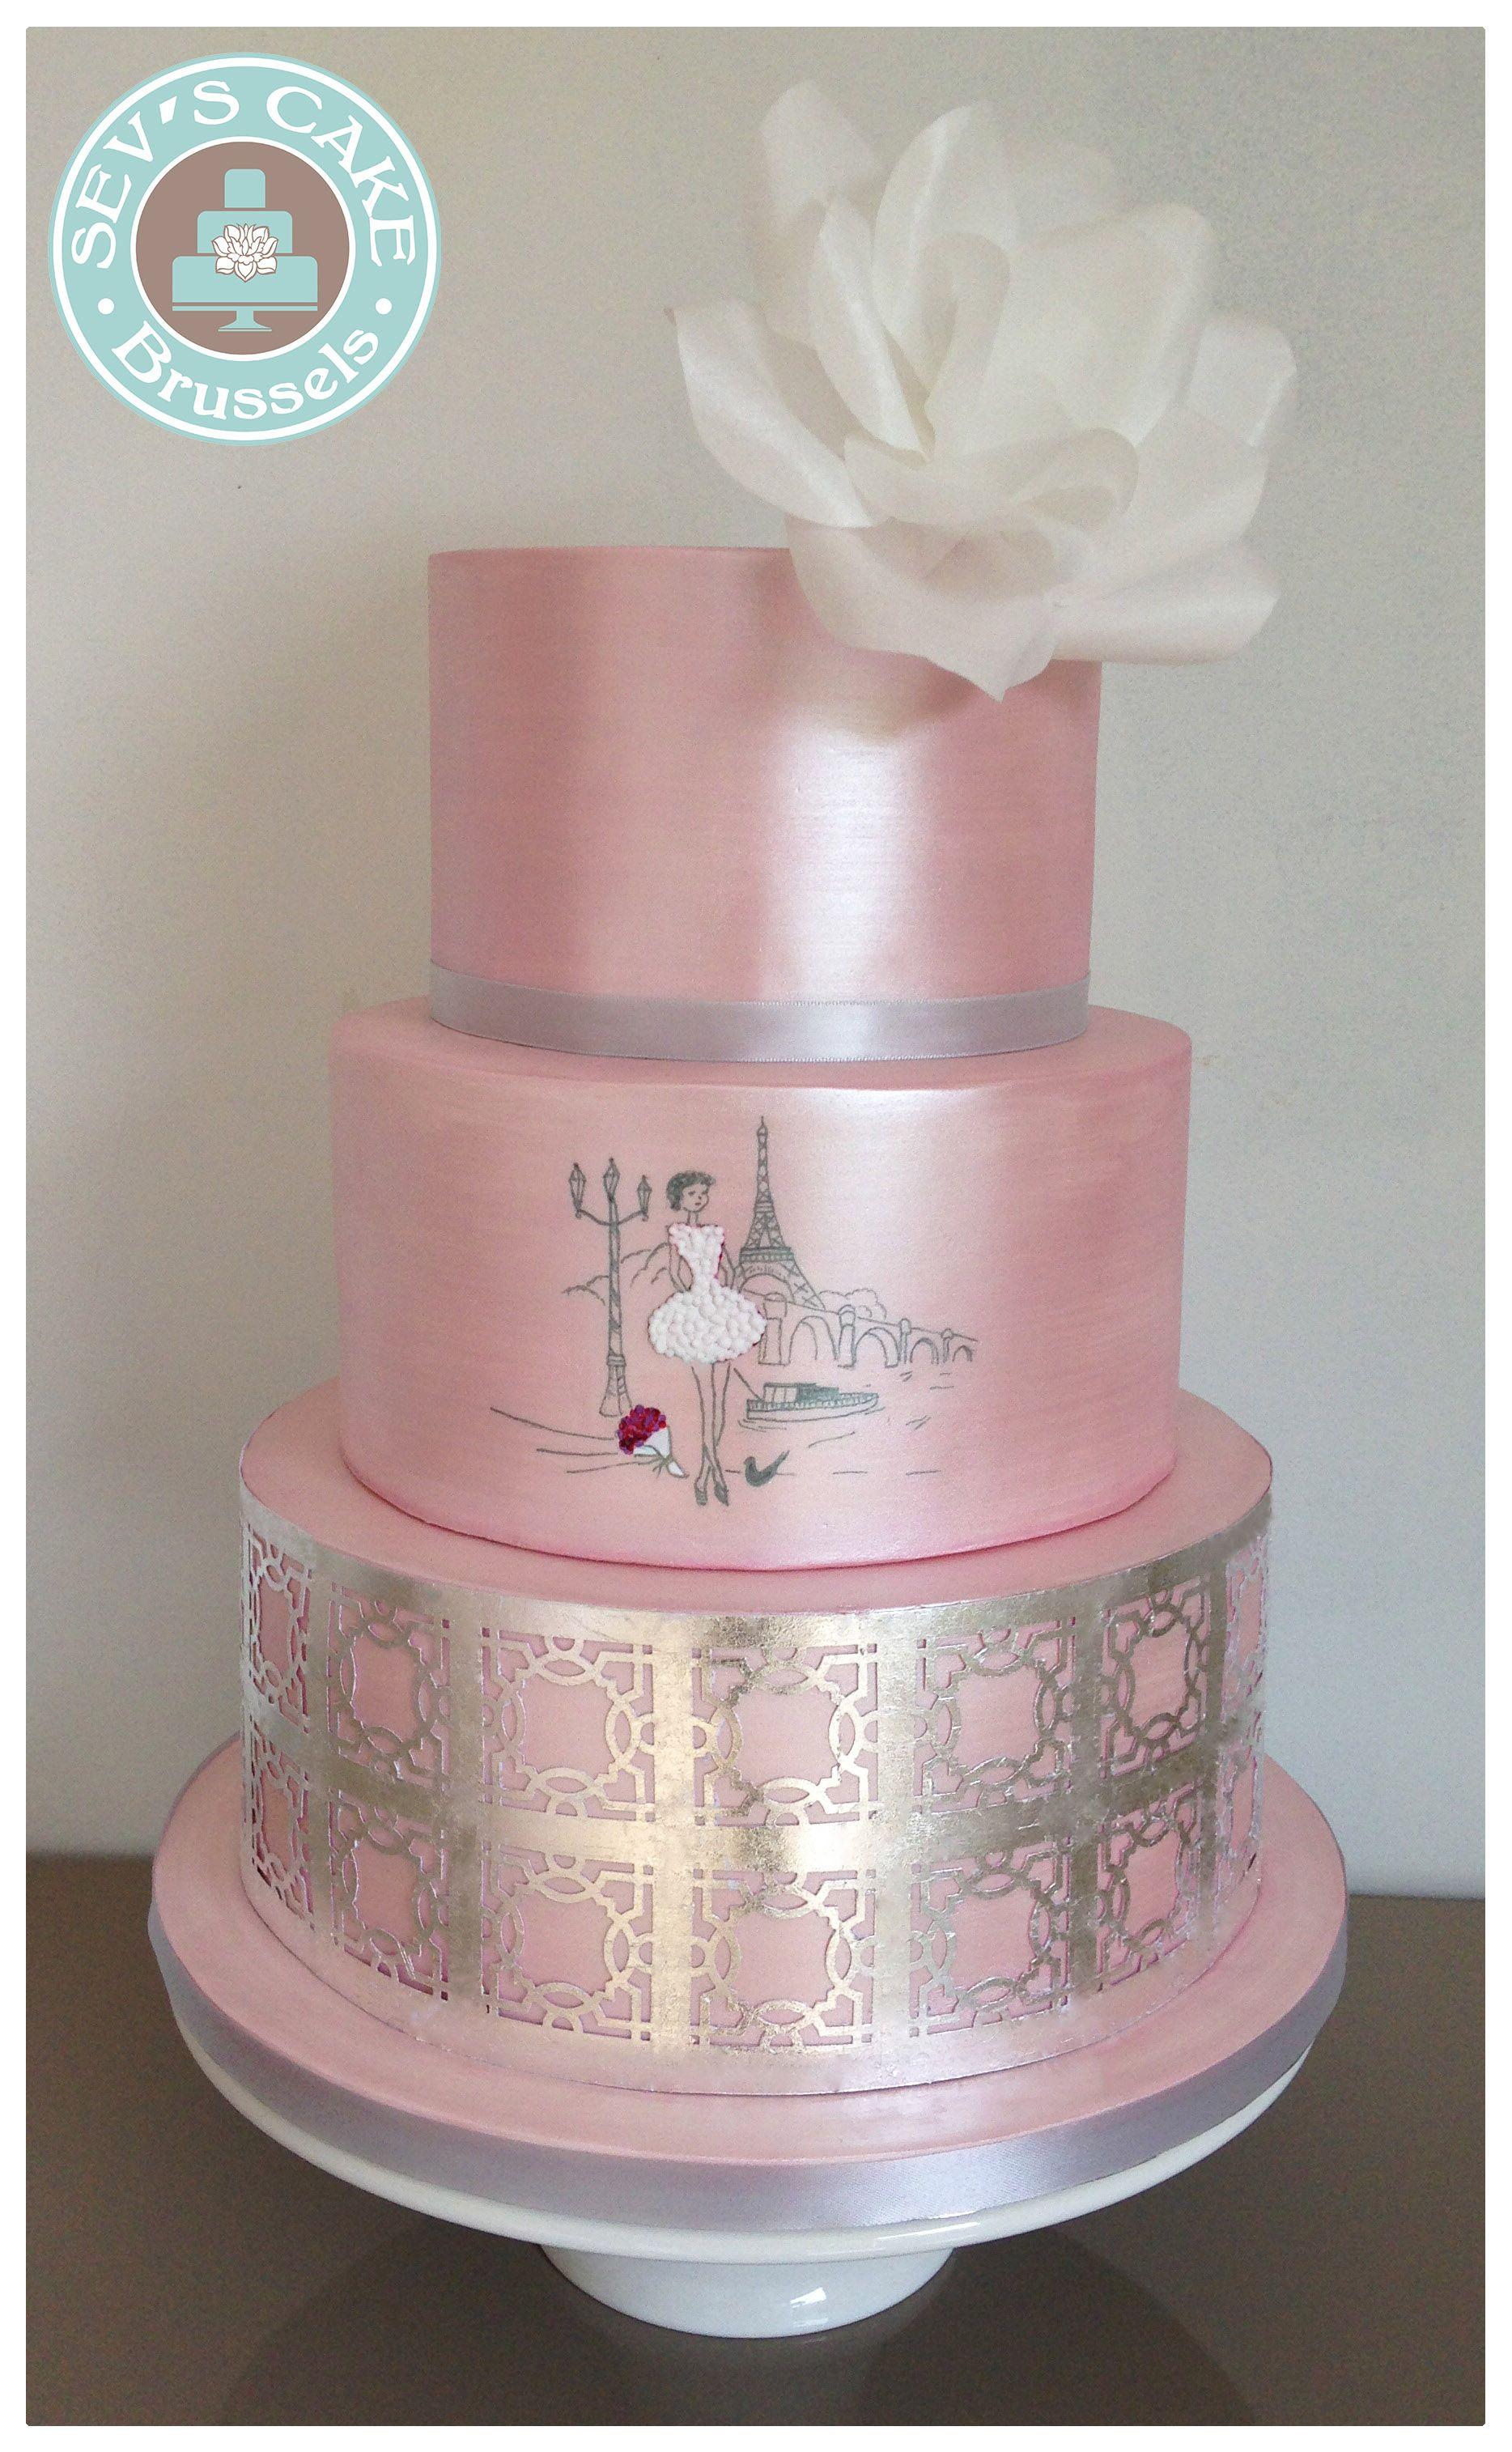 PINK WEDDING CAKE PARIS WITH SILVER LEAVES GATEAU DE